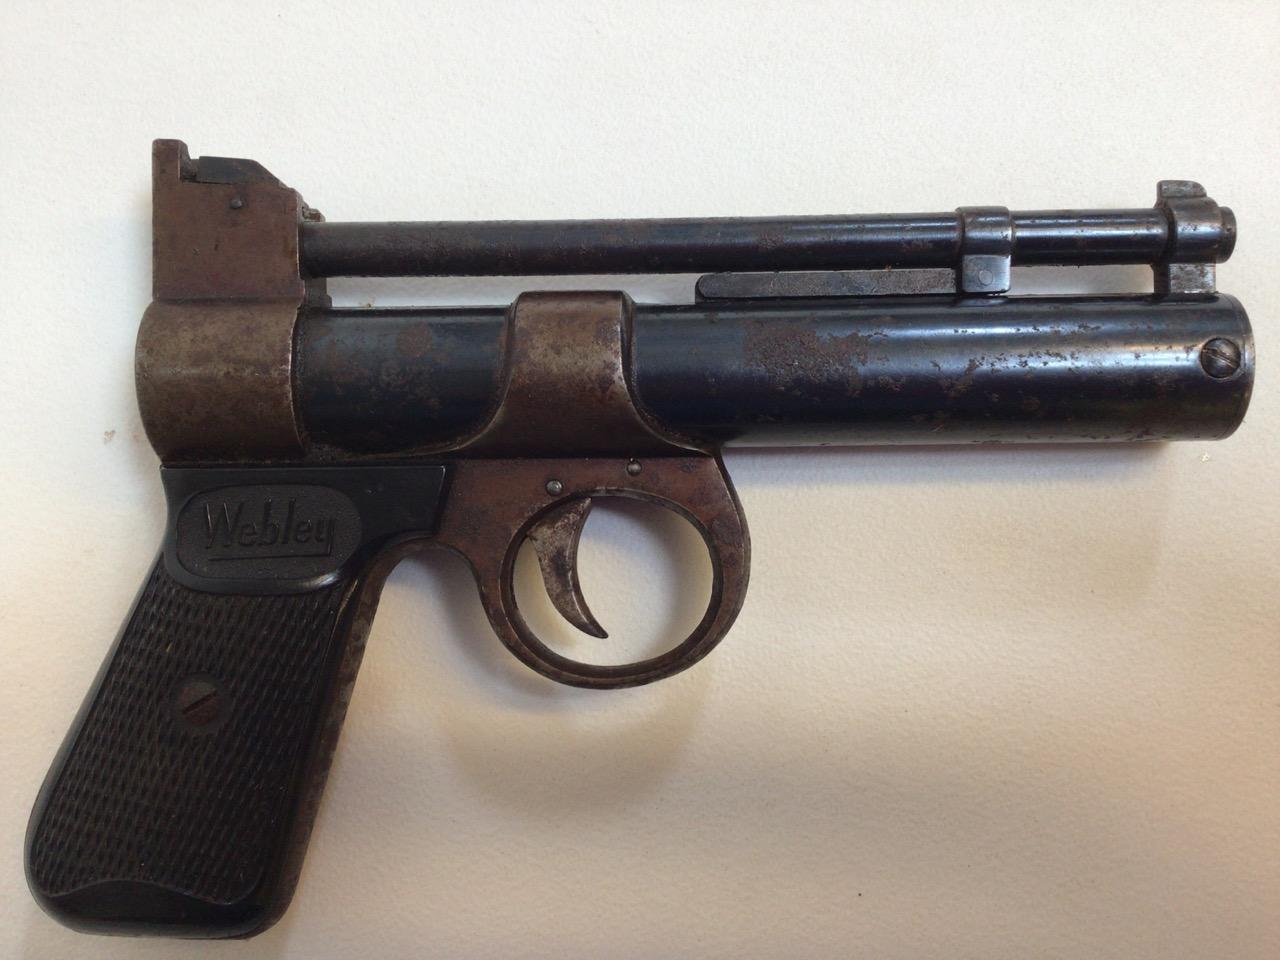 A Webley Junior 177 Air pistol by Webley and Scott ltd Birmingham. - Image 4 of 4